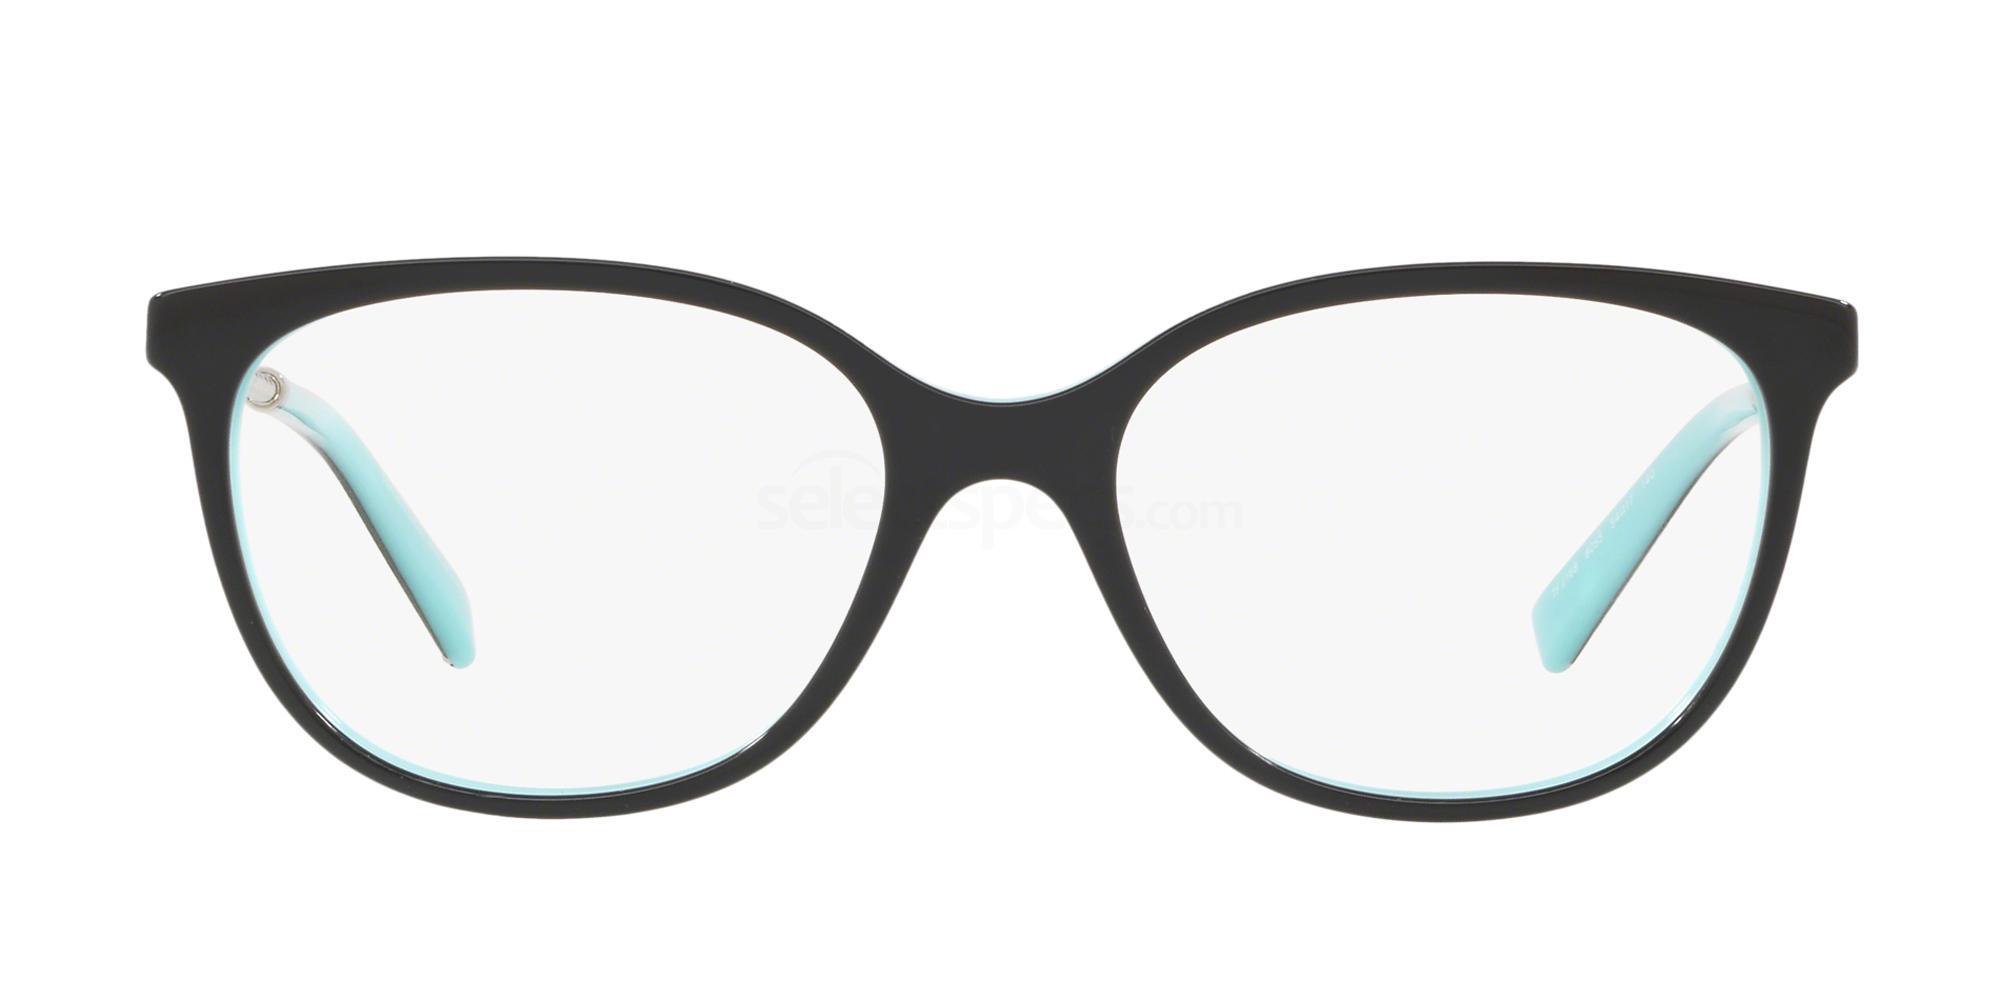 8055 TF2168 Glasses, Tiffany & Co.